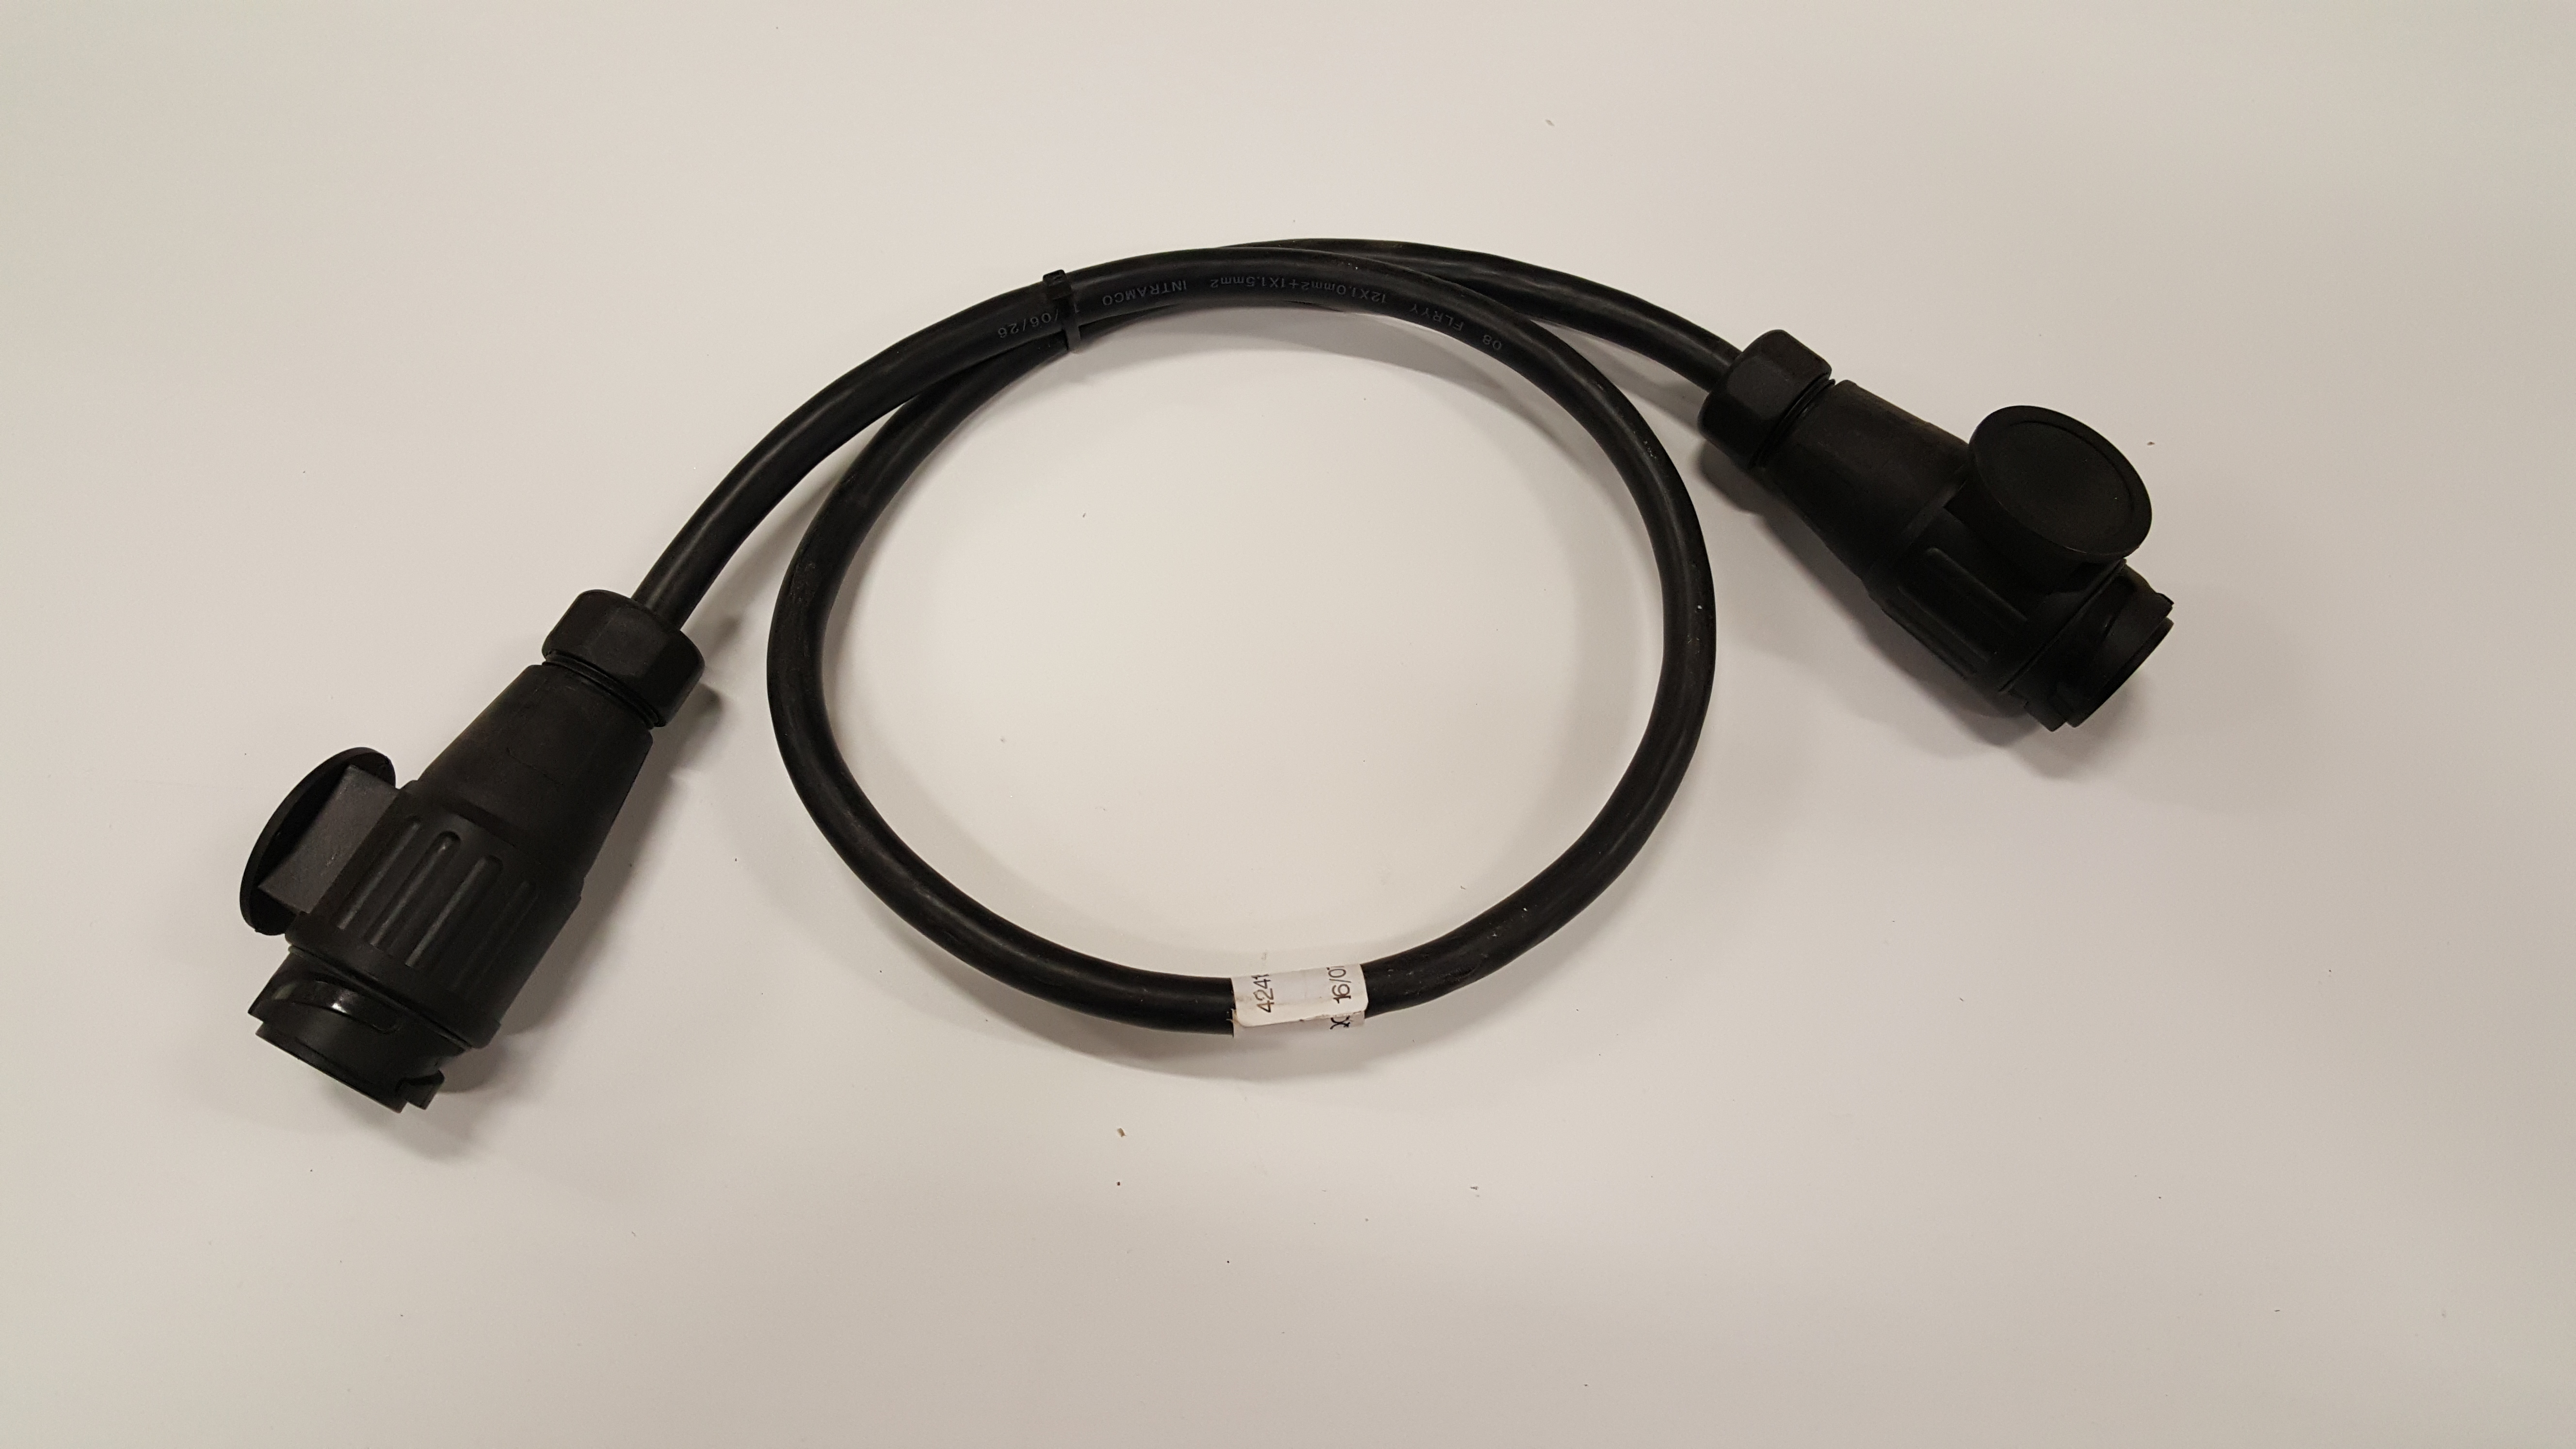 Stekker Kabel 130poli 100cm Brouwer Onderdelen Shop Stekker130poli100cm 1